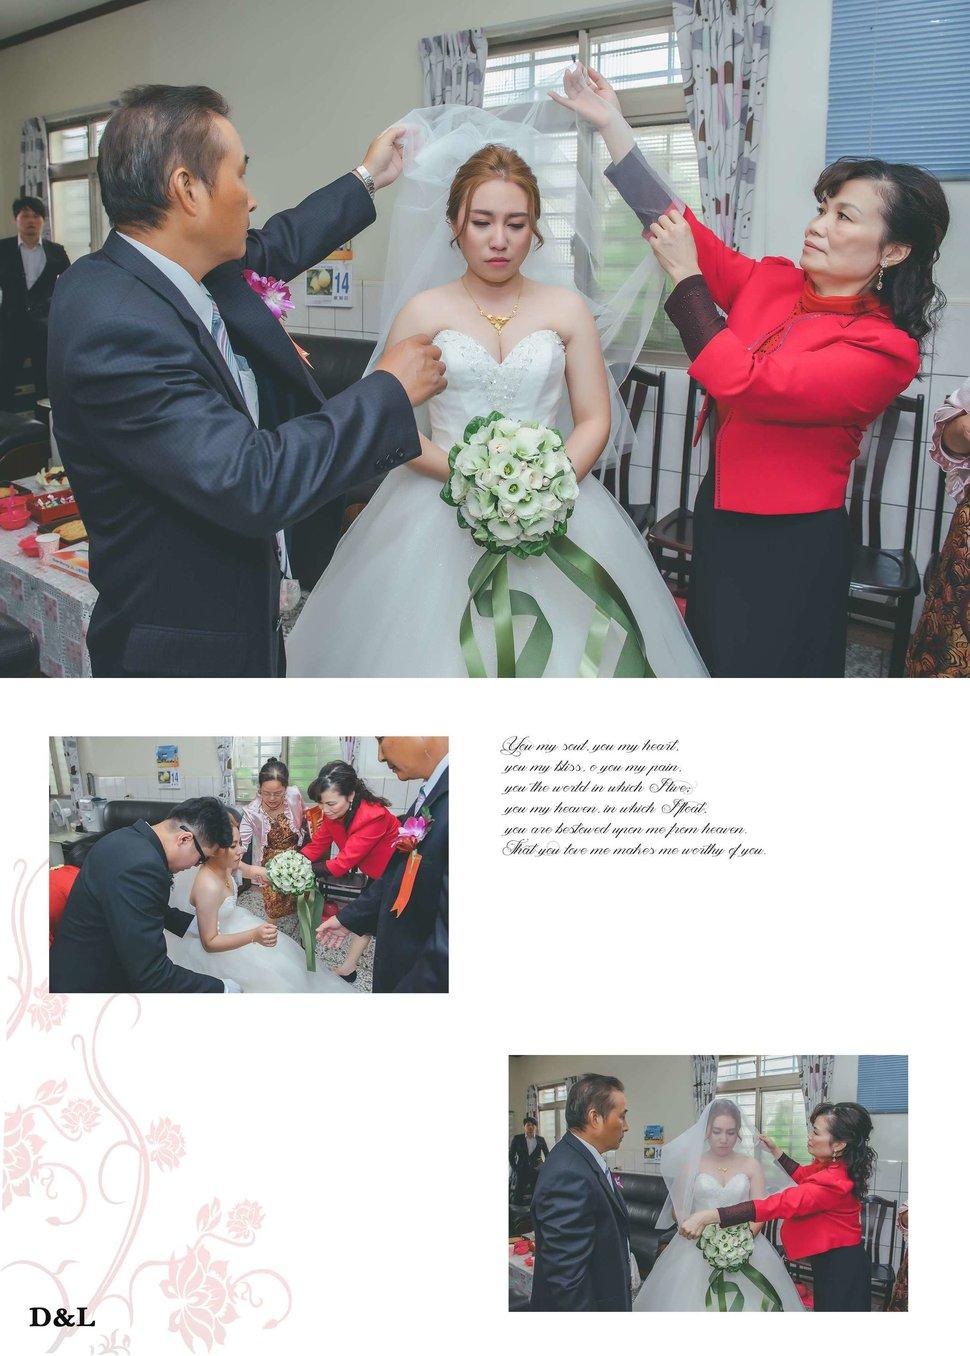 15 - D&L 婚禮事務 · 婚禮婚紗攝影 - 結婚吧